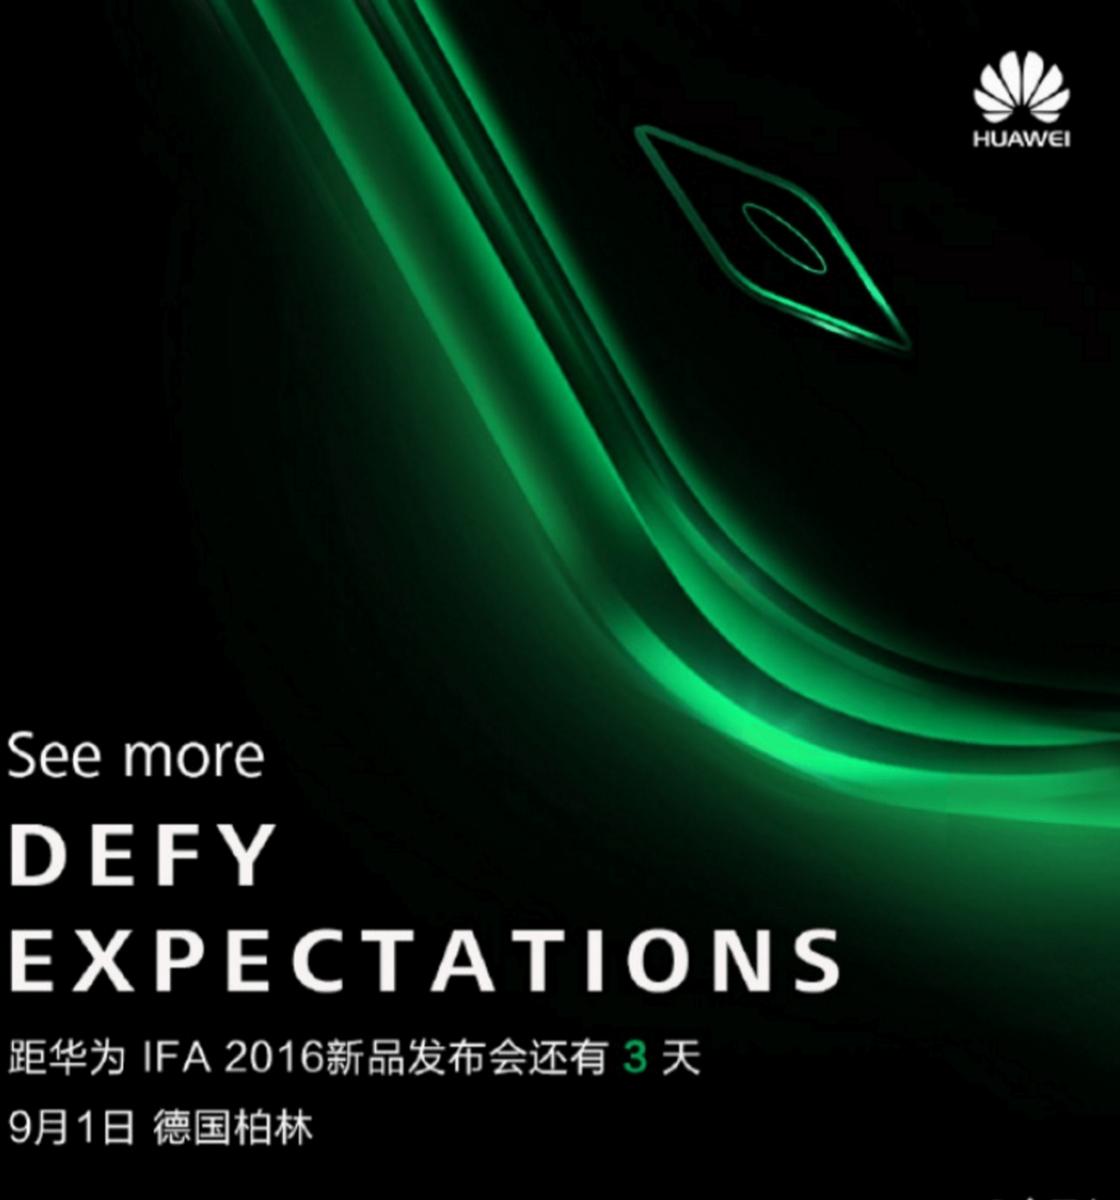 Huawei-ifa2016-teaser-1.png